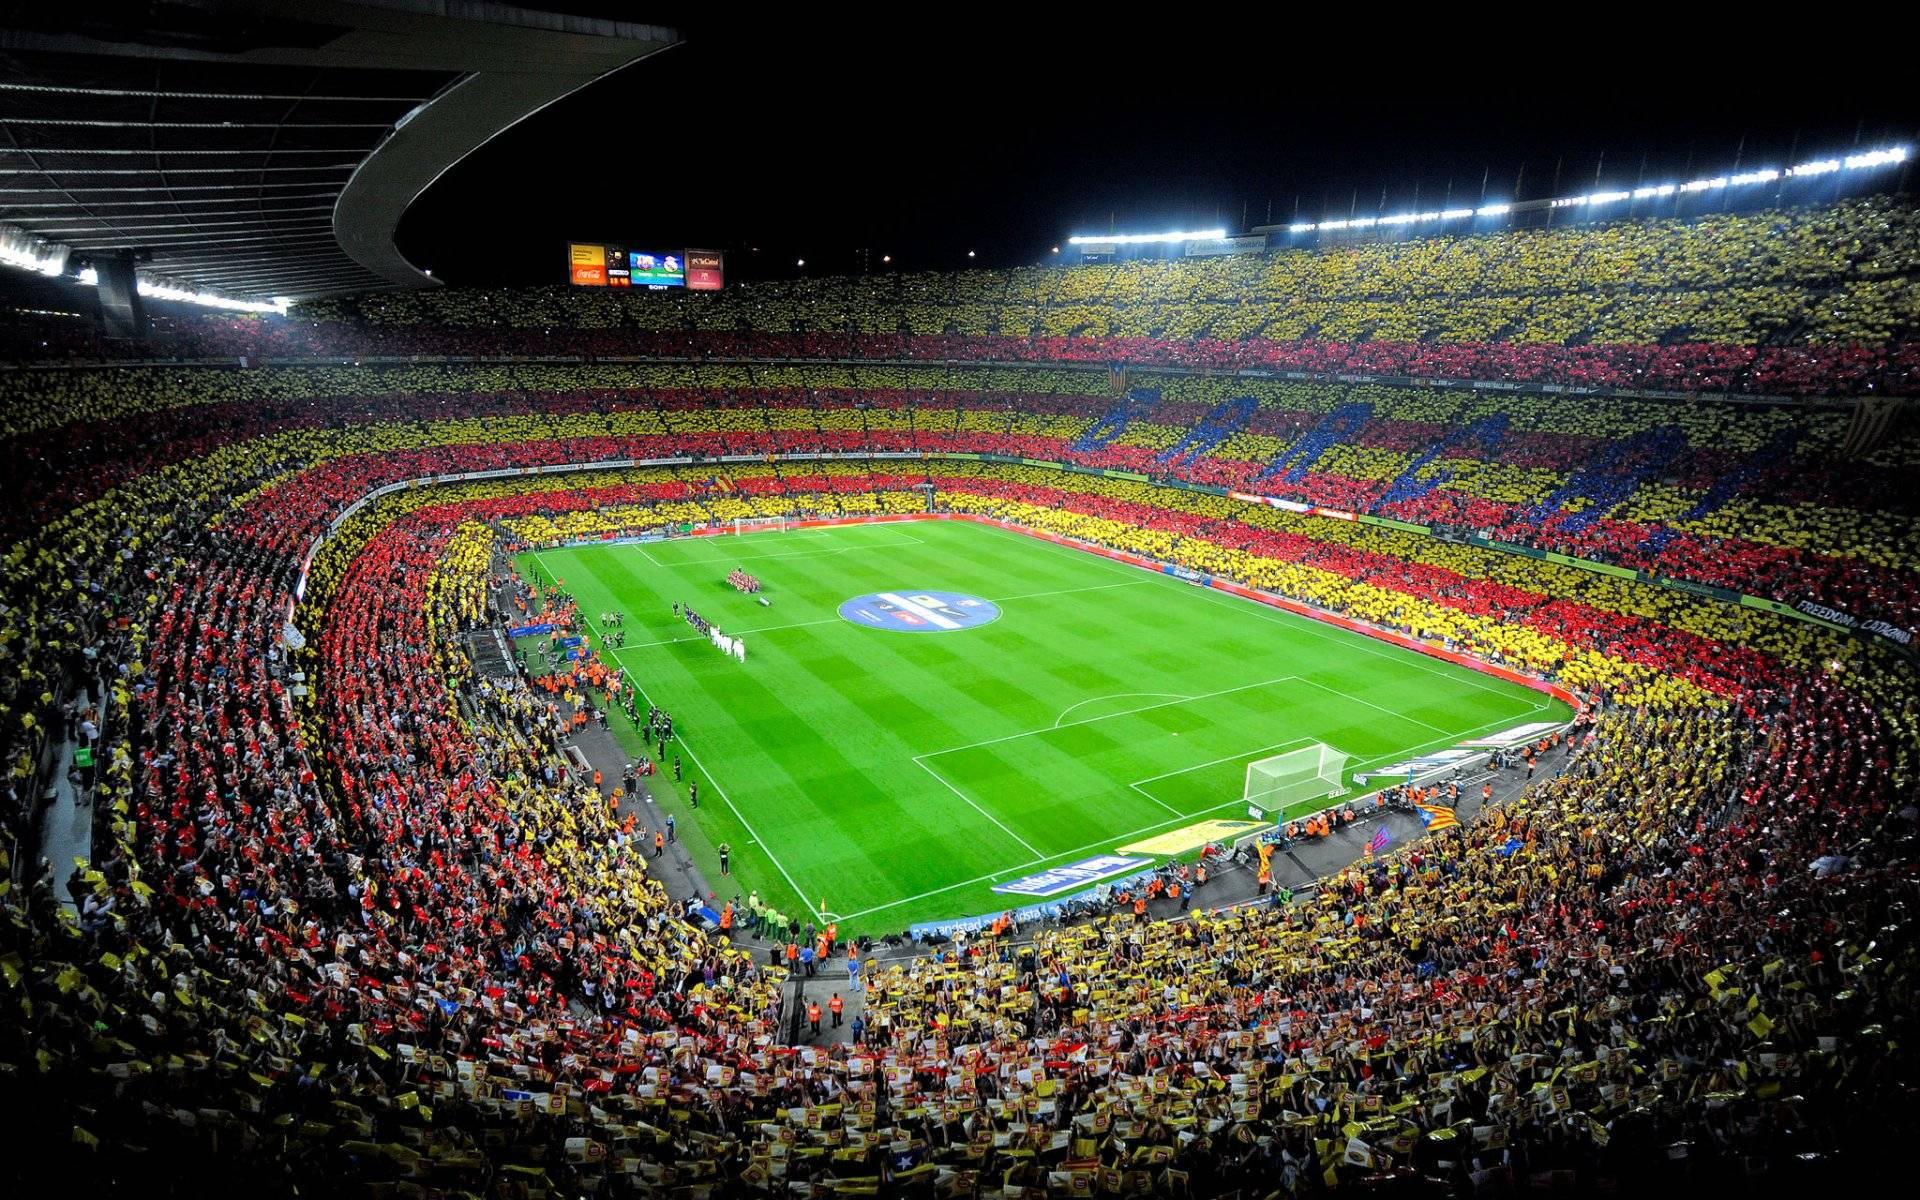 Стадион камп ноу в барселоне: описание, карта, цены на билеты | вся планета